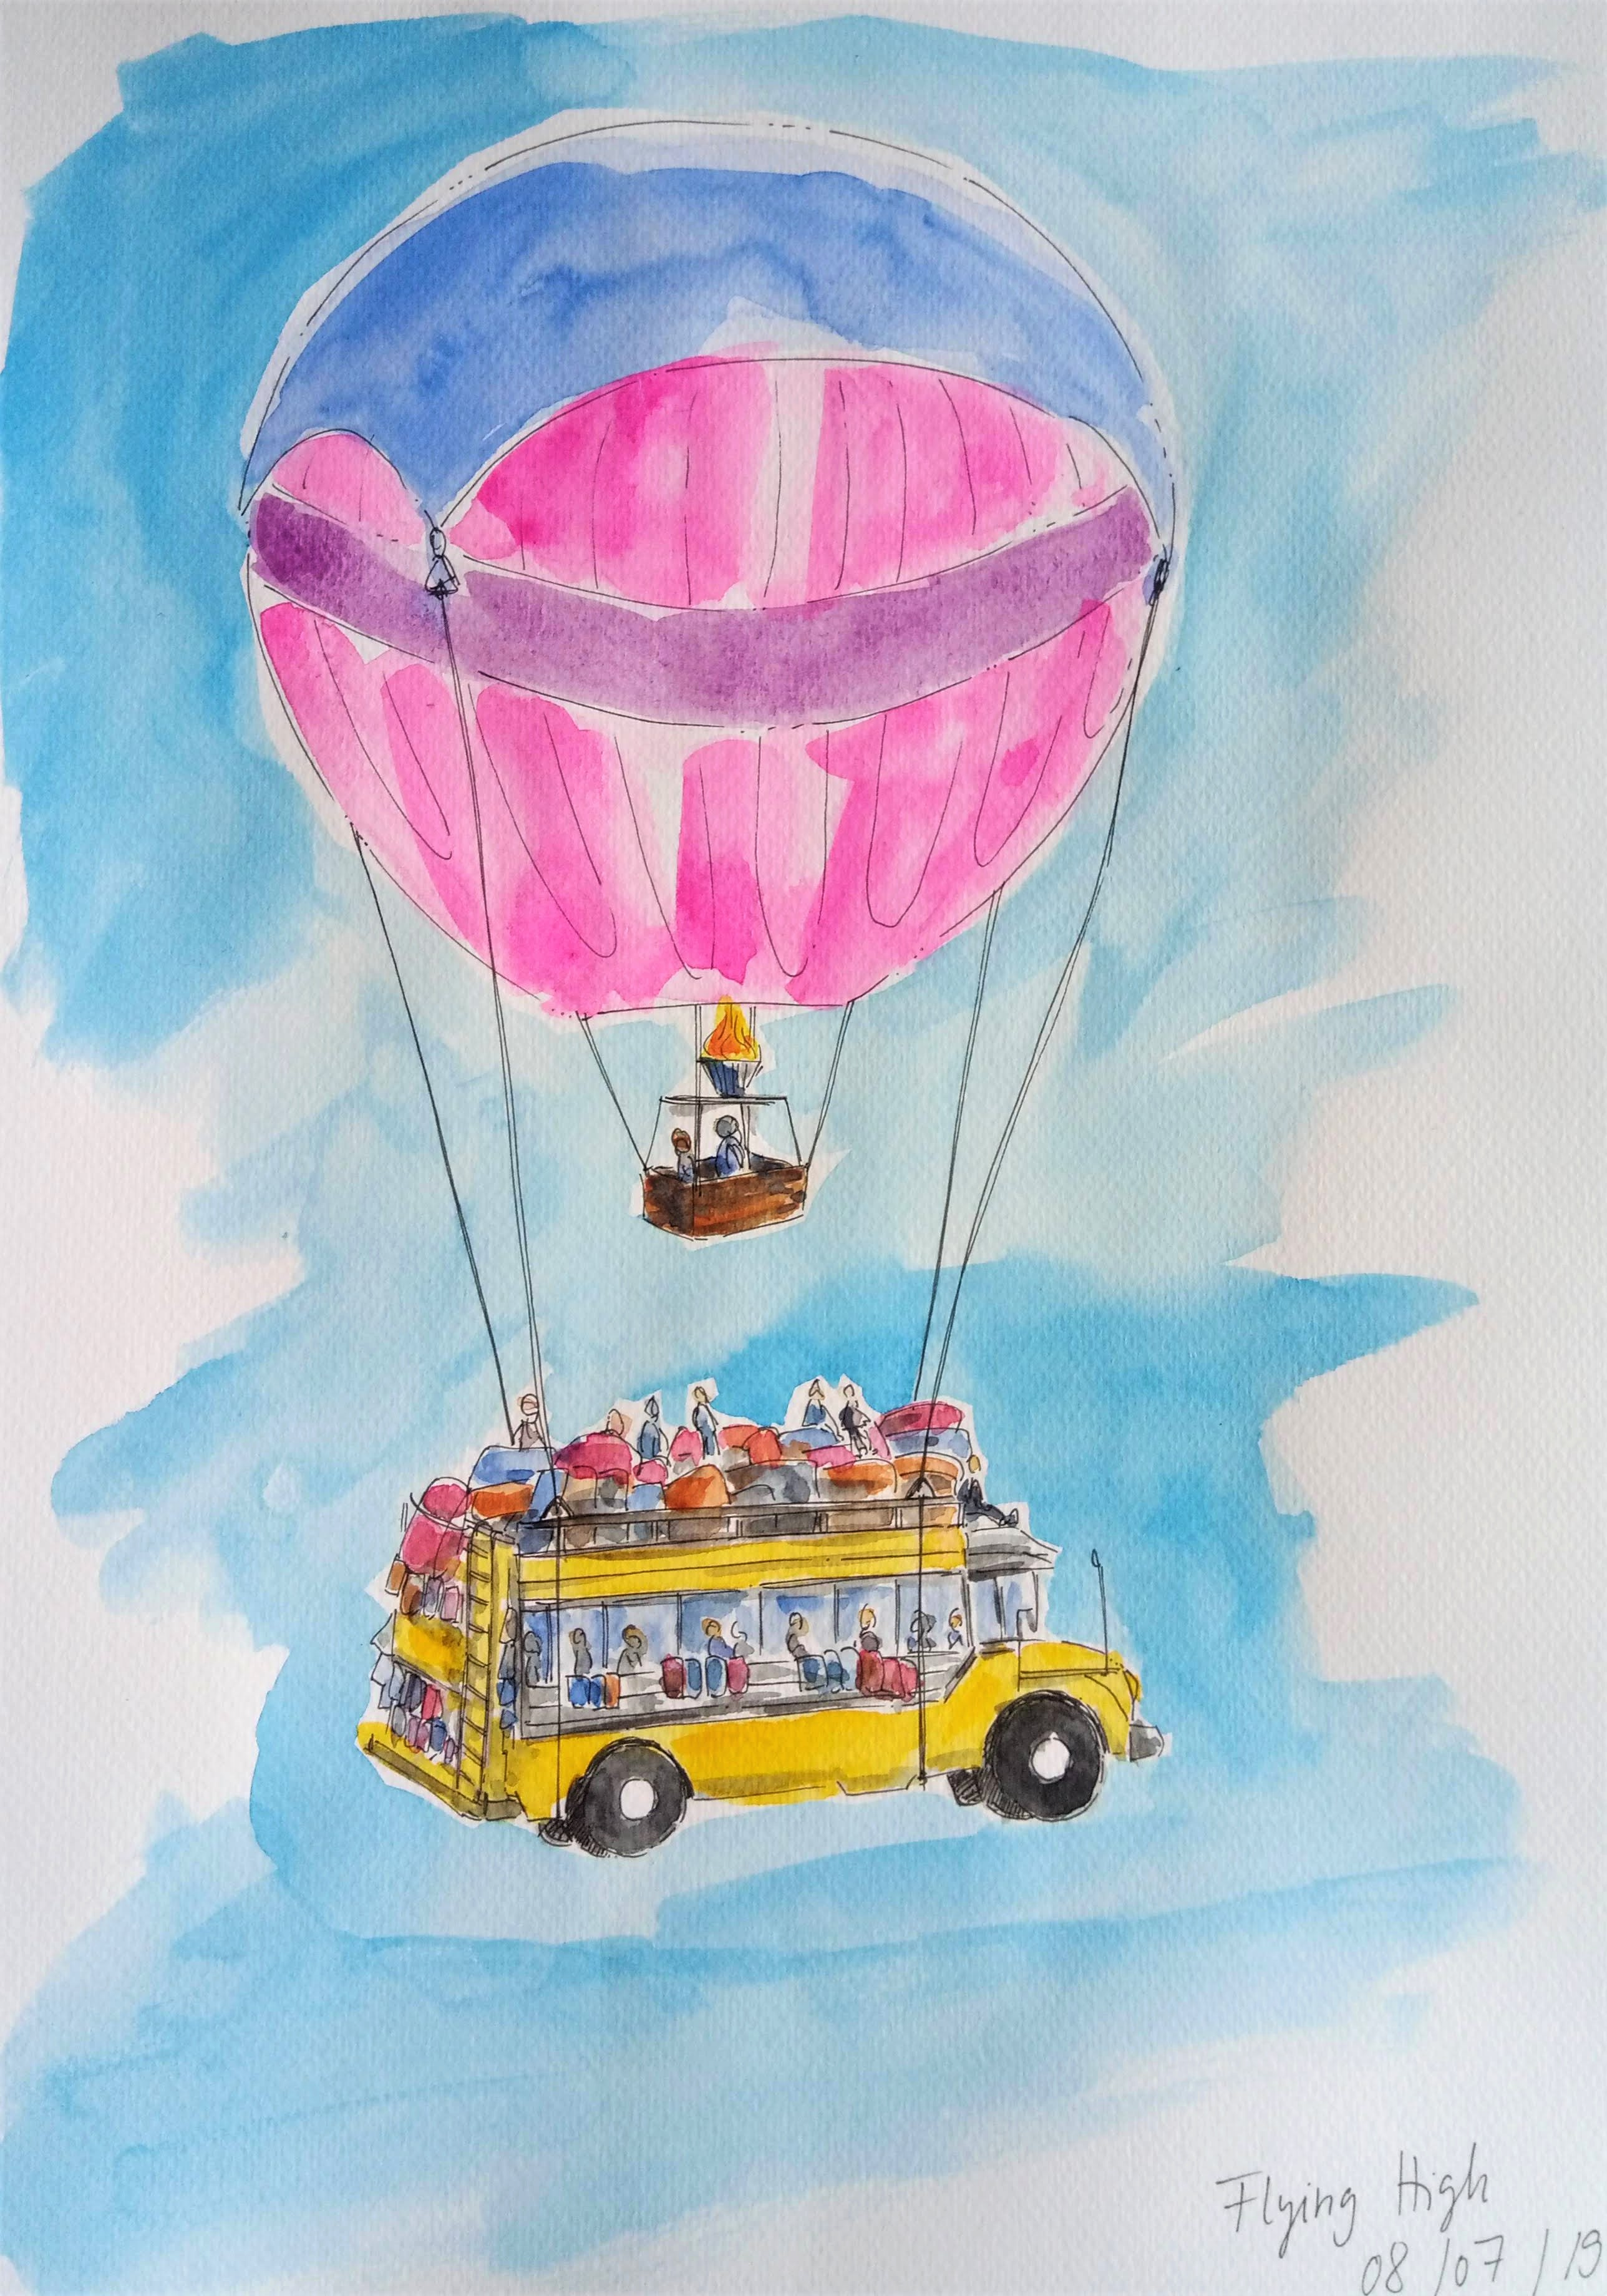 190708 Flying High_WorldWatercolorMonth_Melanie Franz